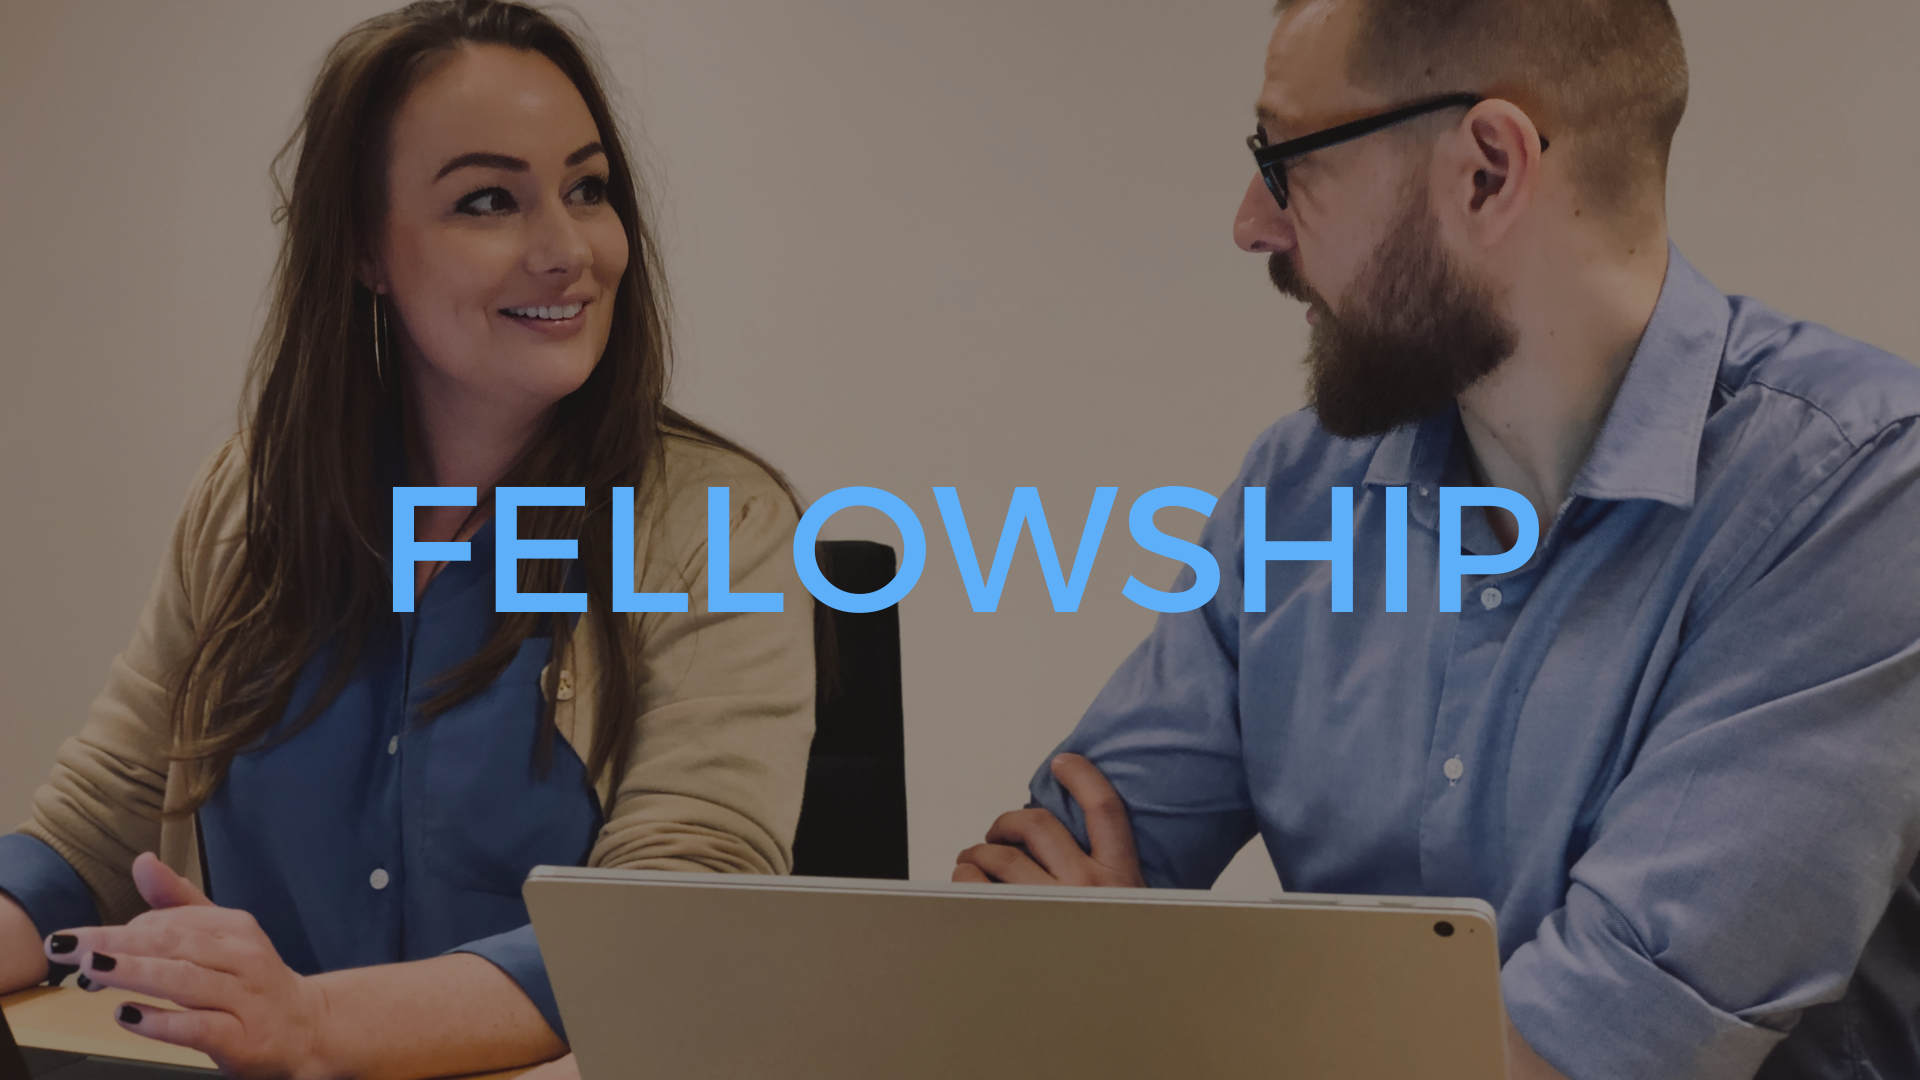 Projectum value Fellowship